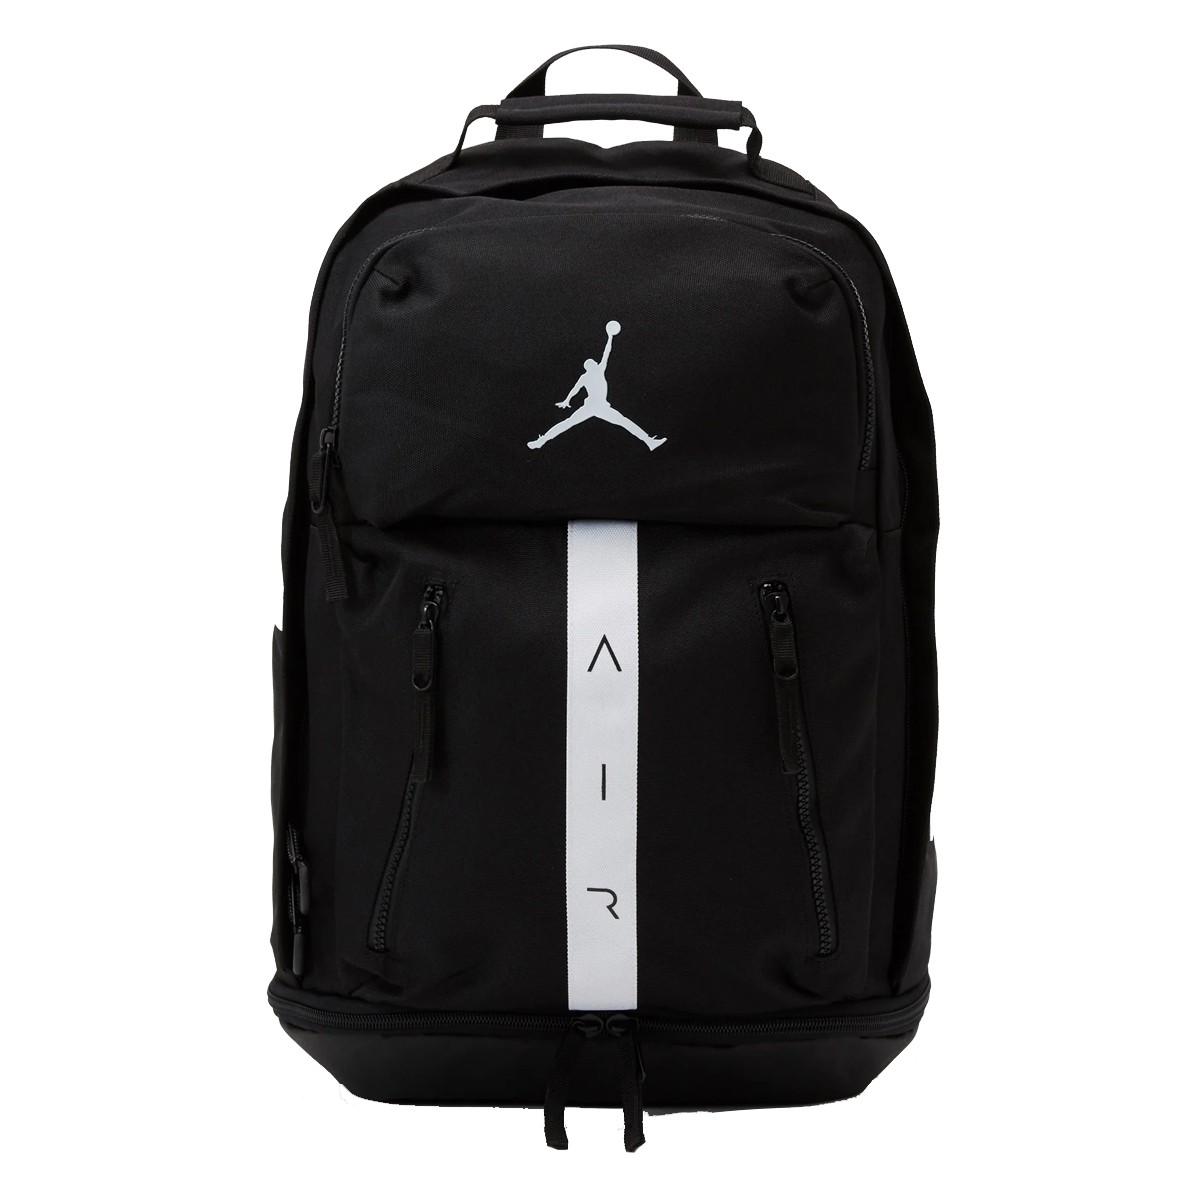 Mochila Jordan Air Performance Pack 'Black'